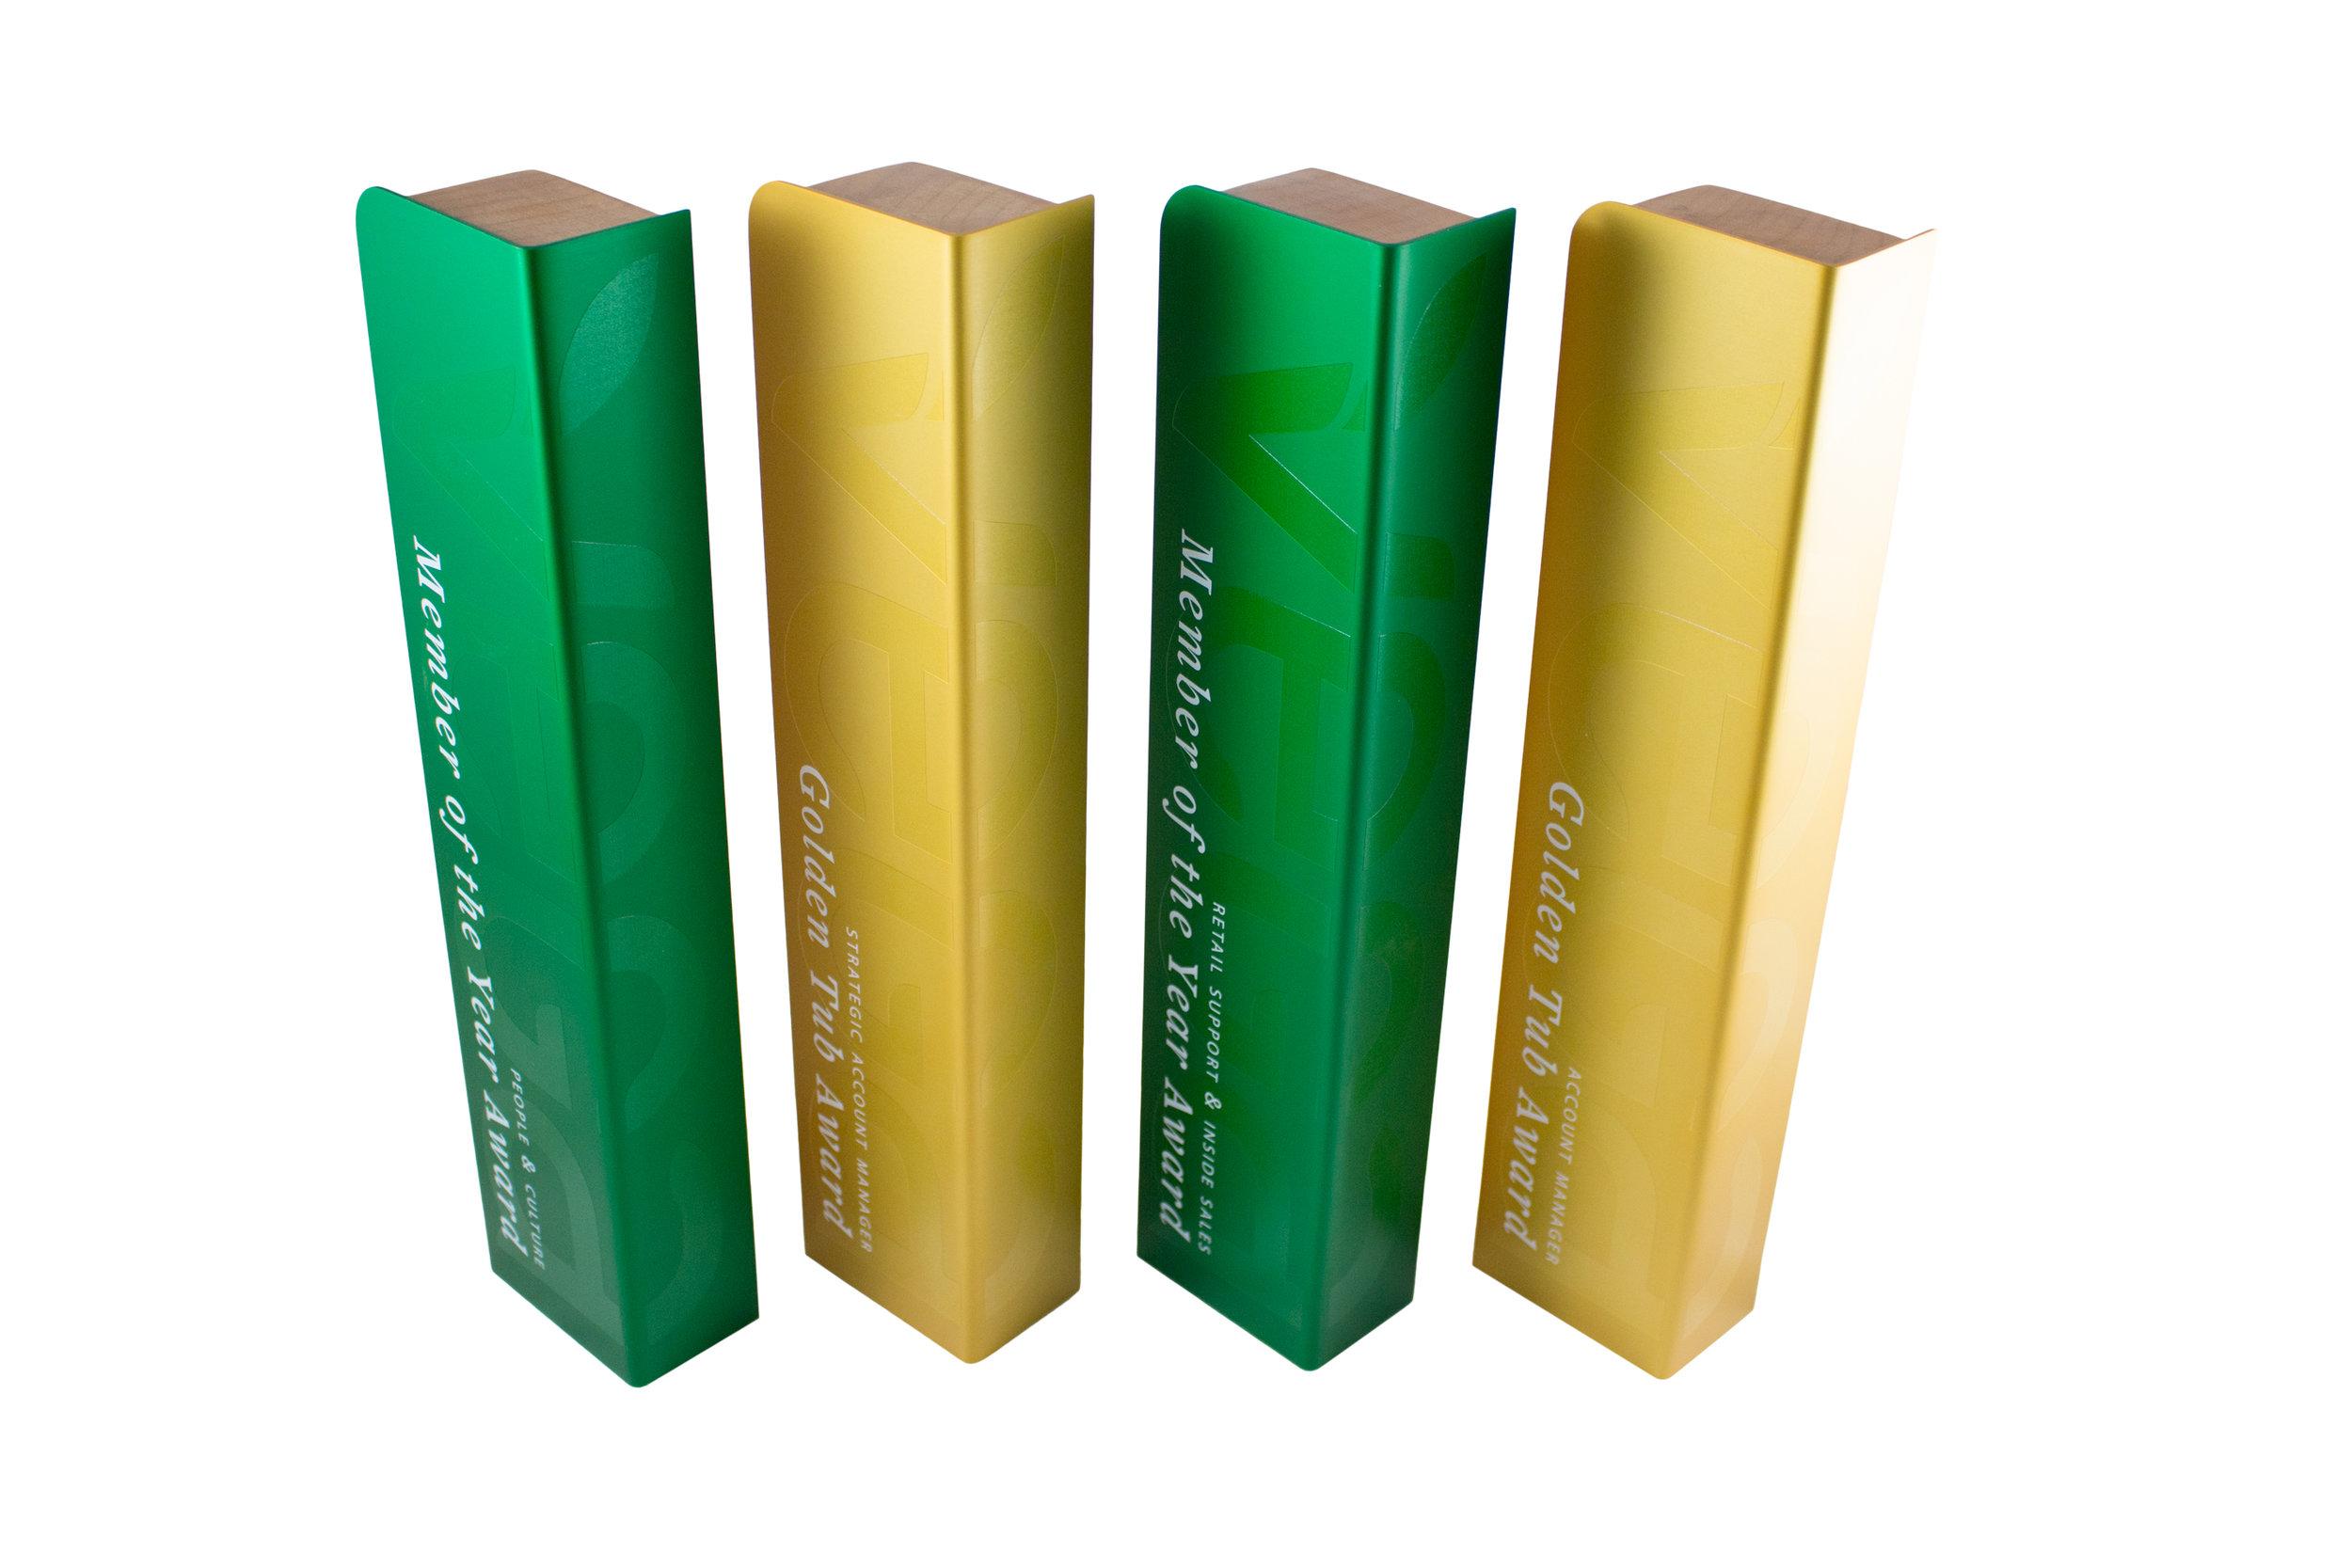 vega custom recovered wood sustainable awards trophies